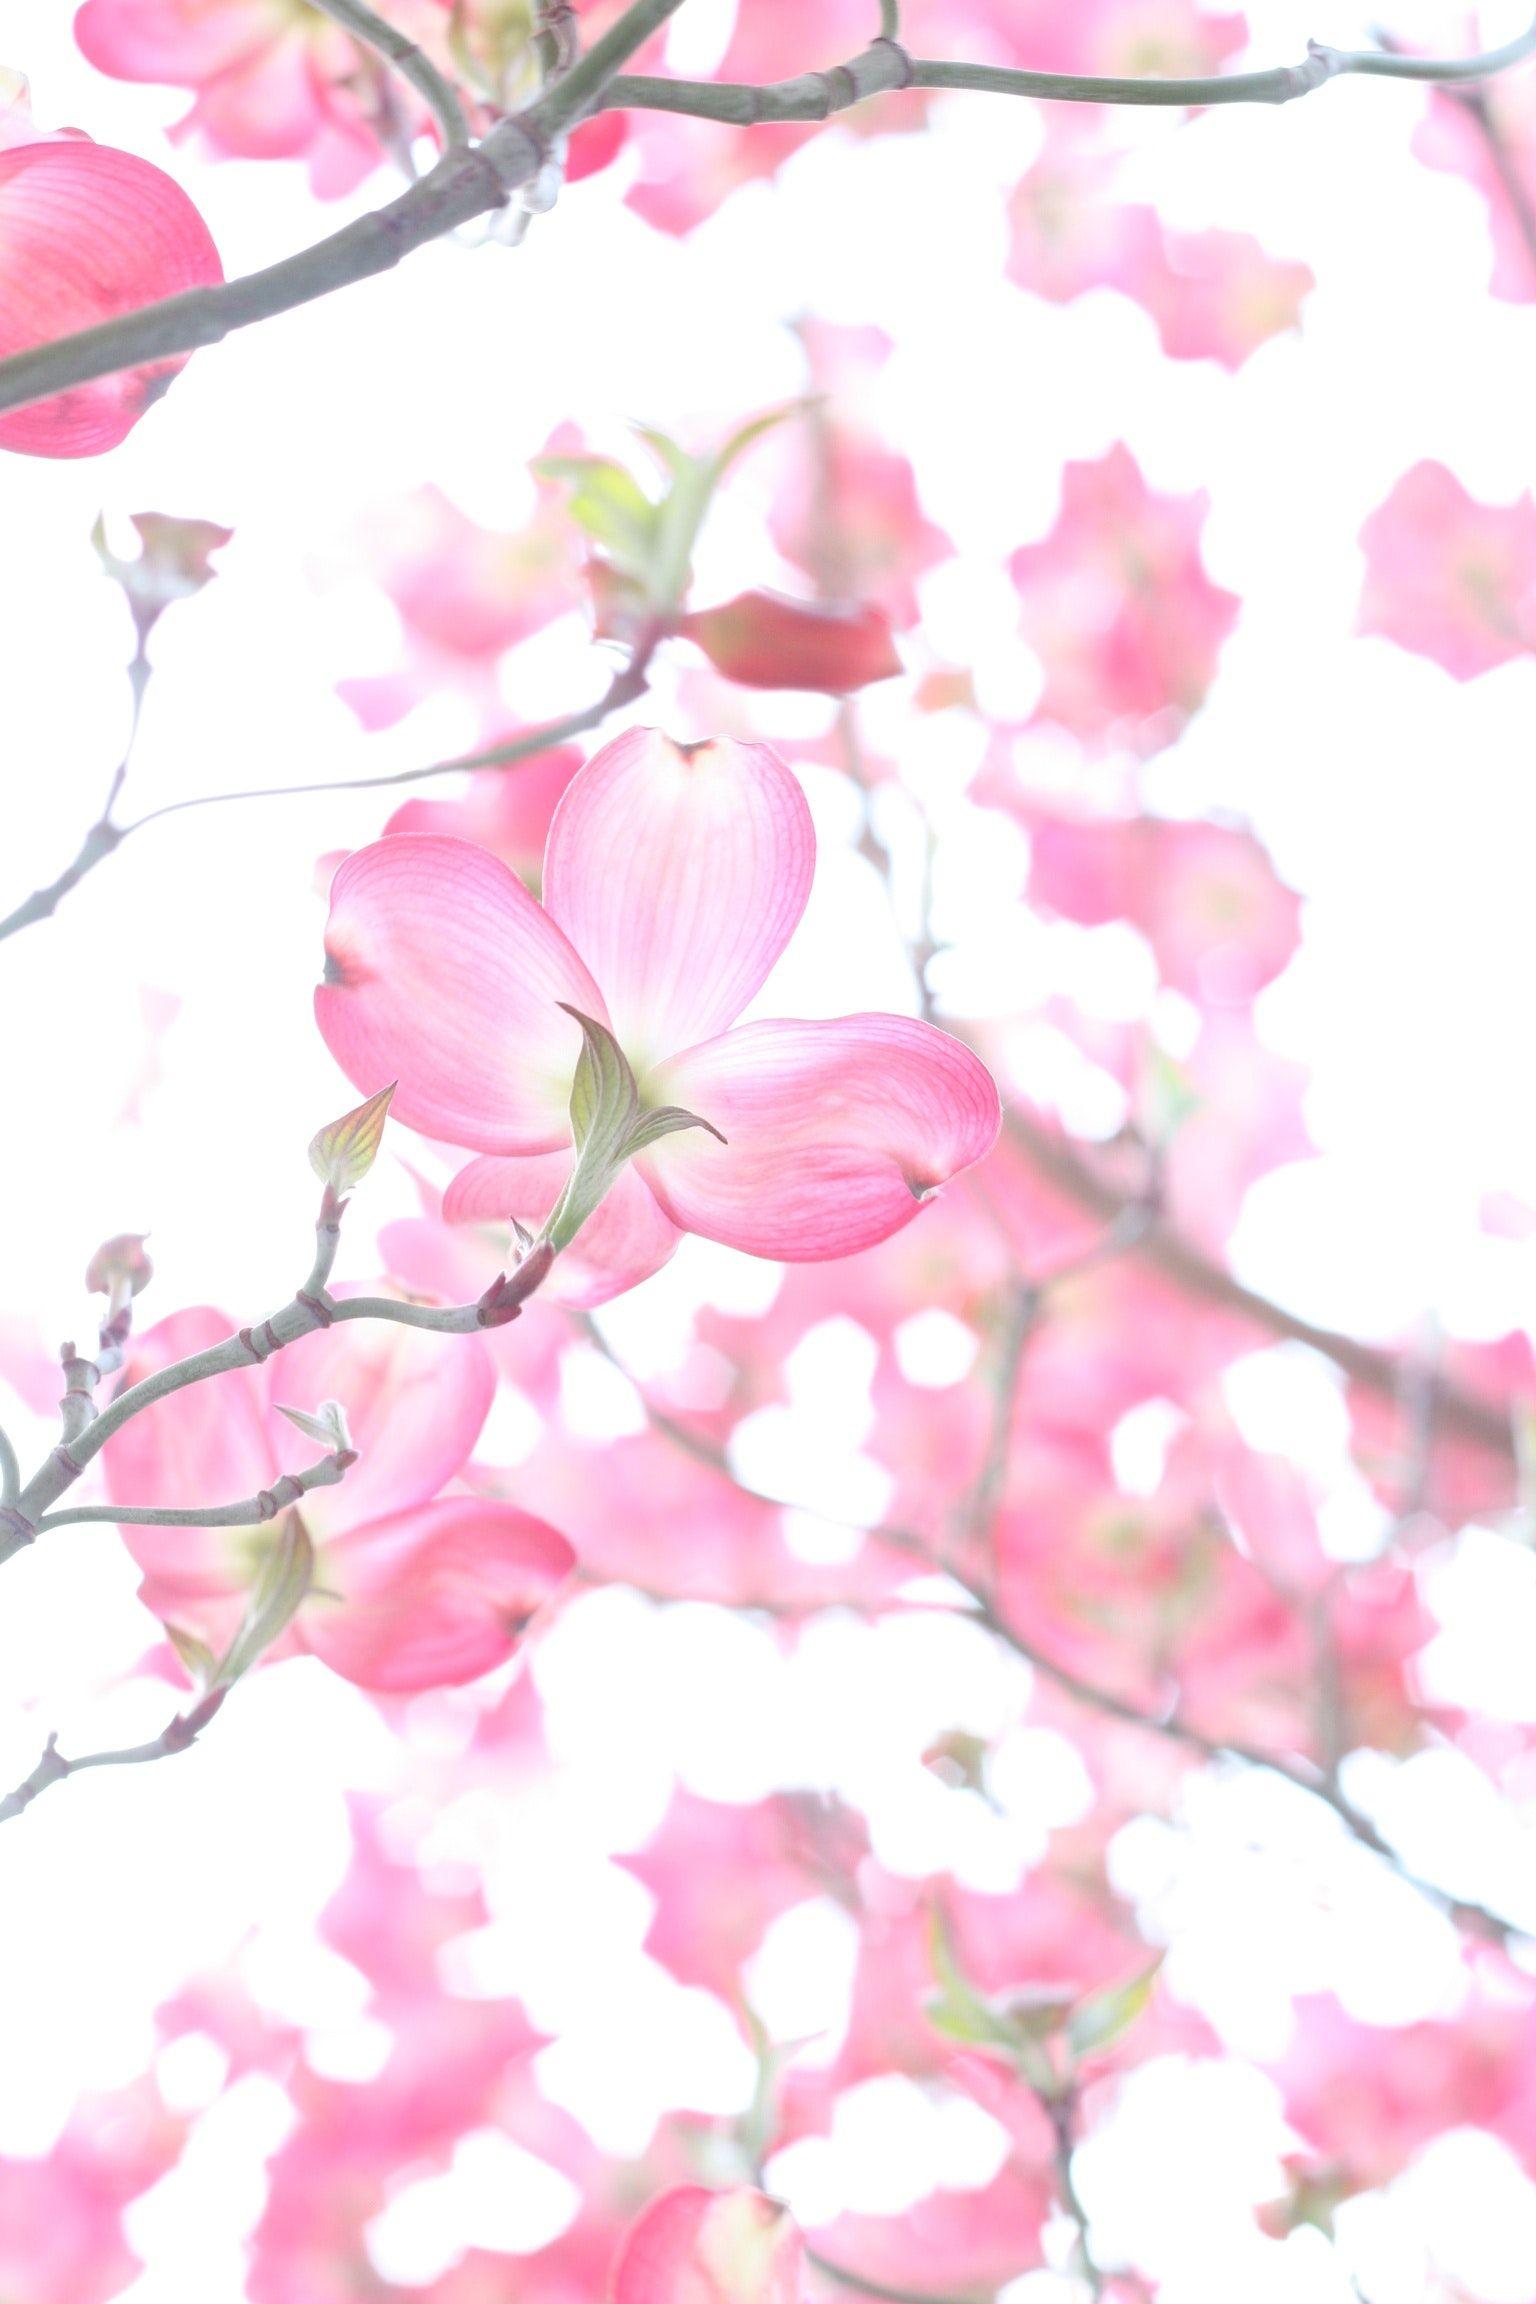 Relationship Benefits Of Couples Massage Organic Gardening Gardening Tips Flower Images